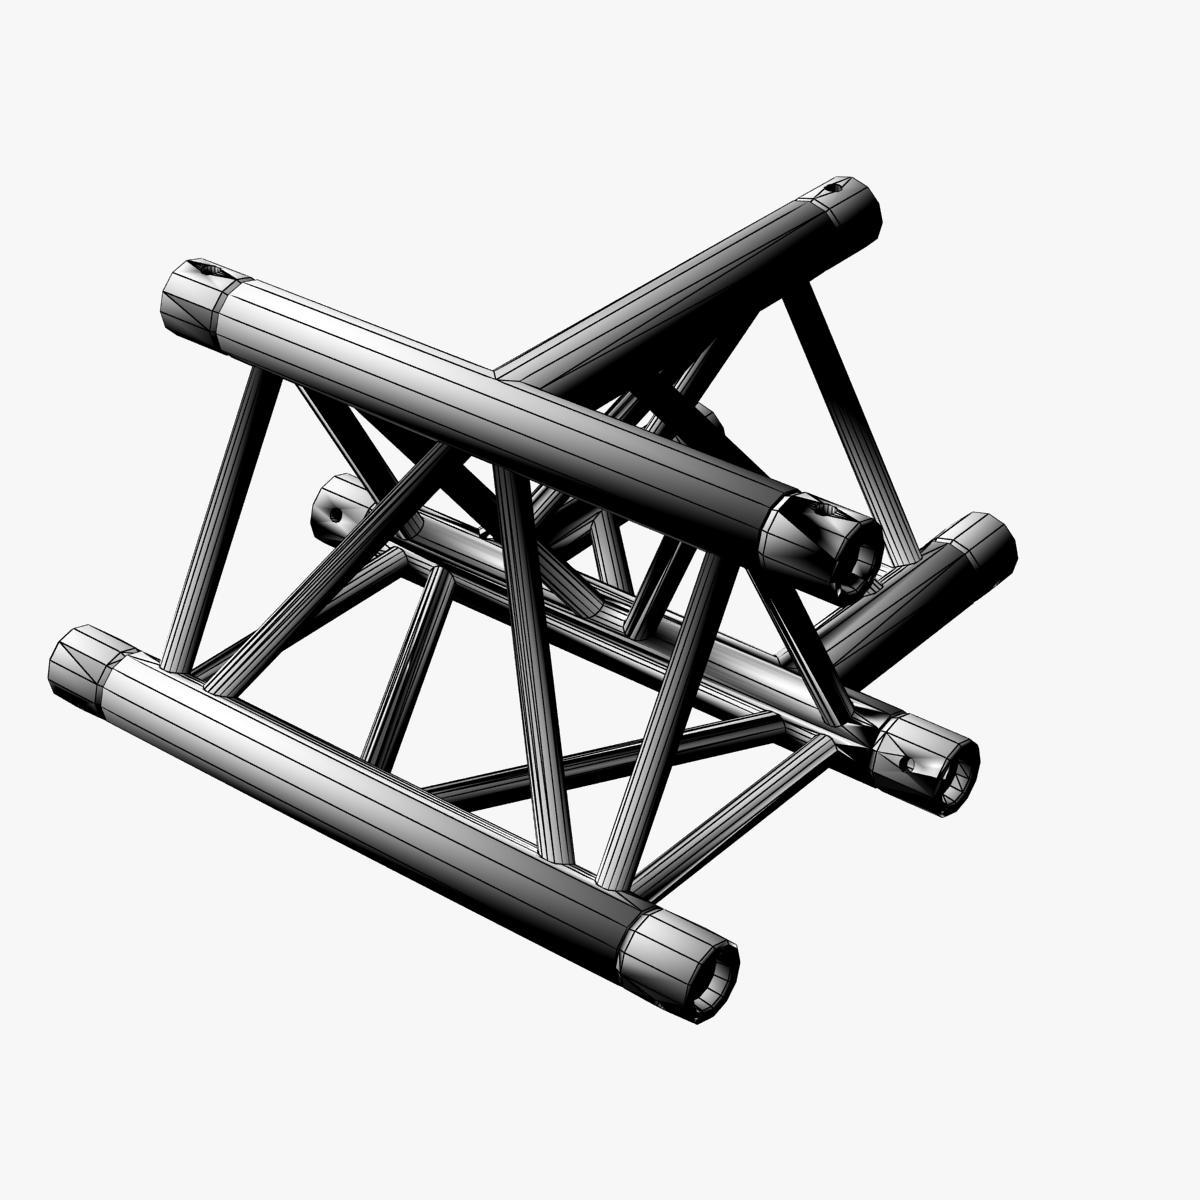 Triangular Truss Cross T Junction 84 3d model 3ds max dxf fbx b3d c4d  obj 268957